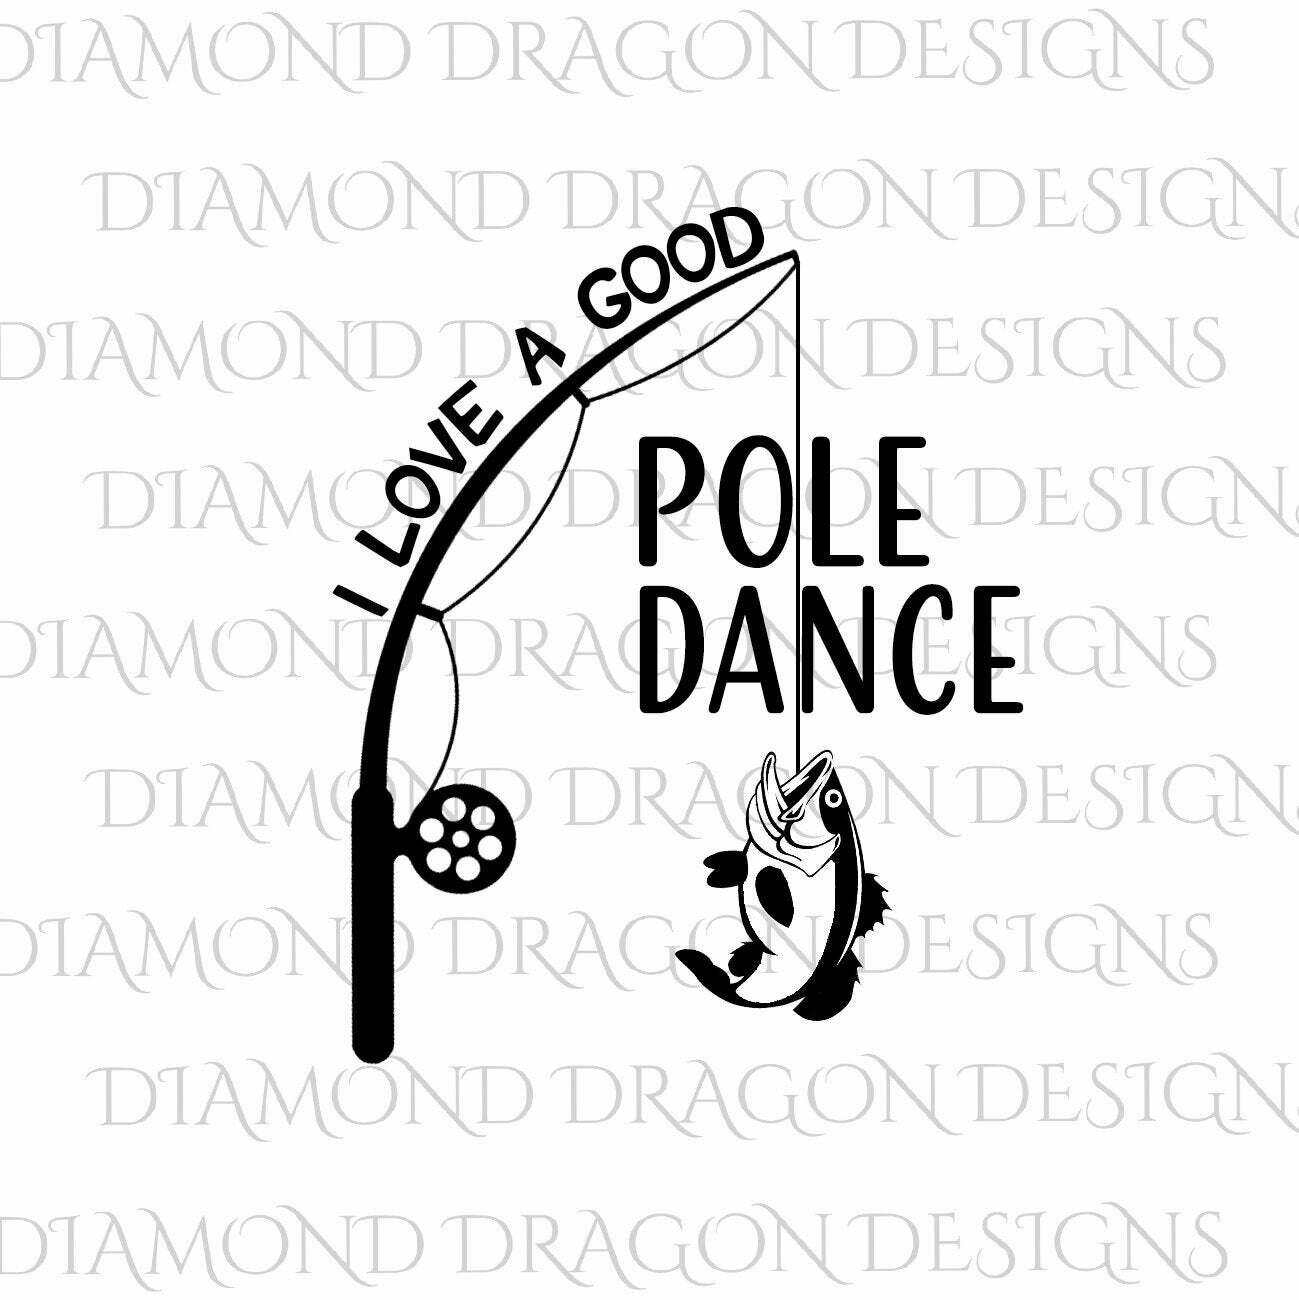 Fishing - I Love a Good Pole Dance, Pole Dance, Fishing Rod, Father's Day, Digital Image